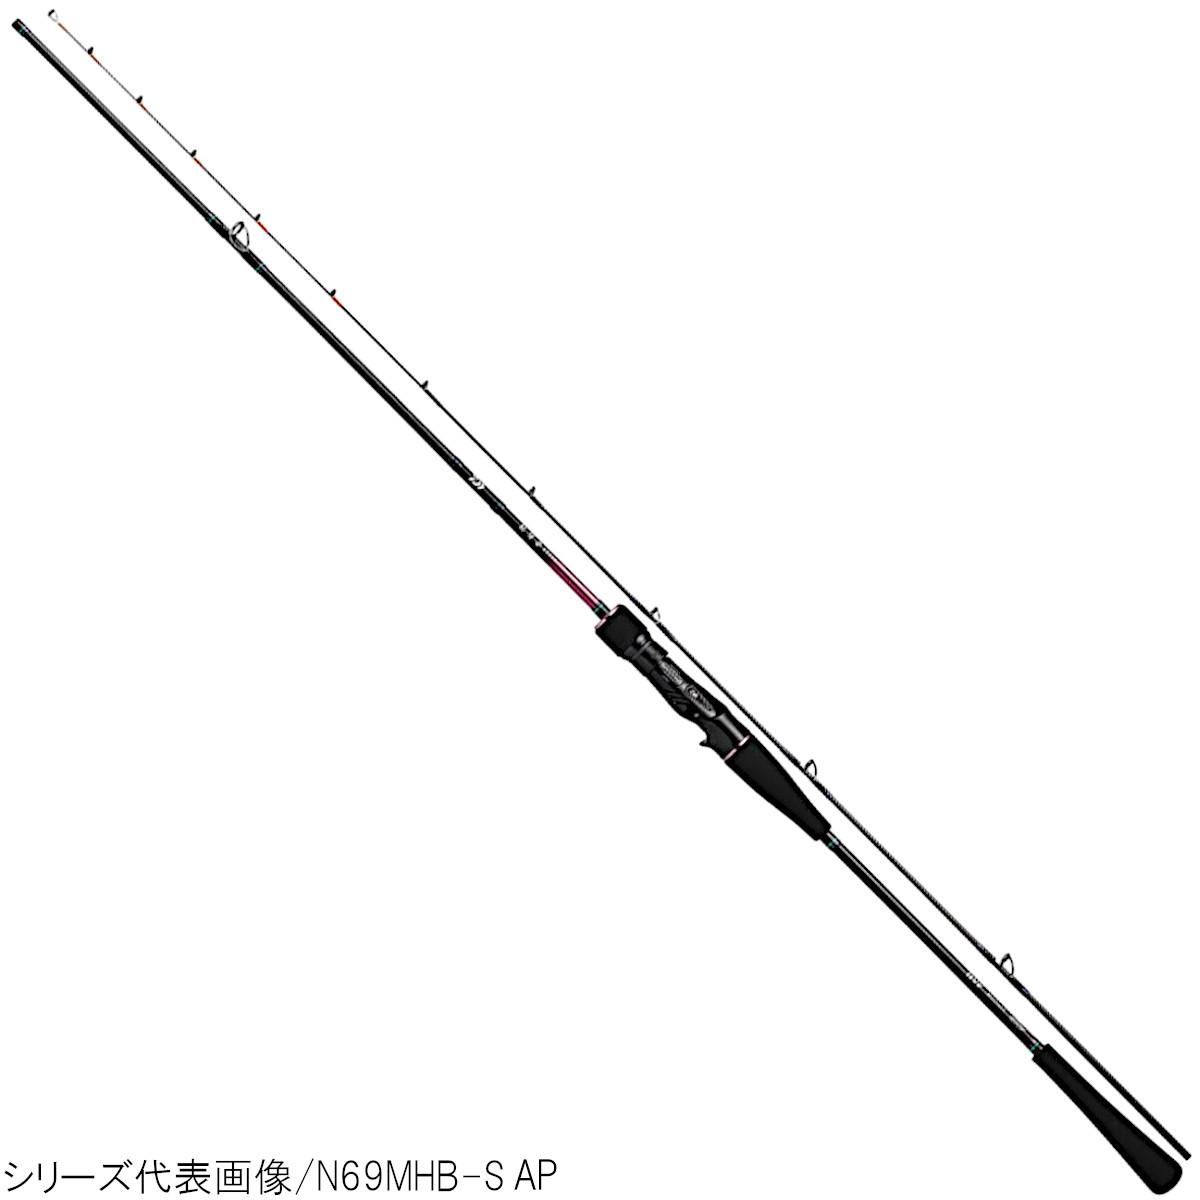 紅牙 K67XHB-S AP ダイワ【同梱不可】